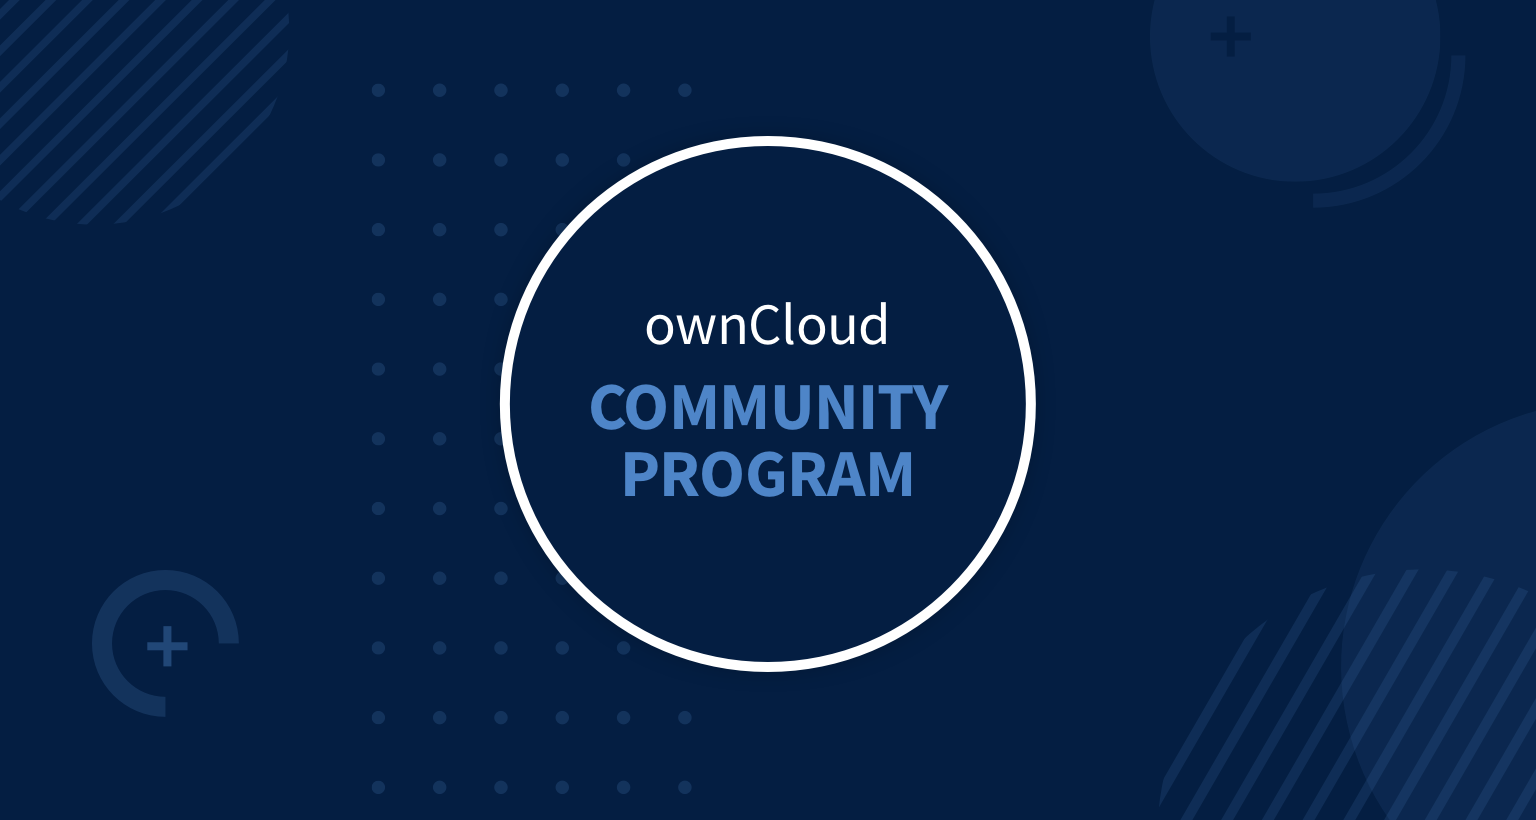 ownCloud Community Program